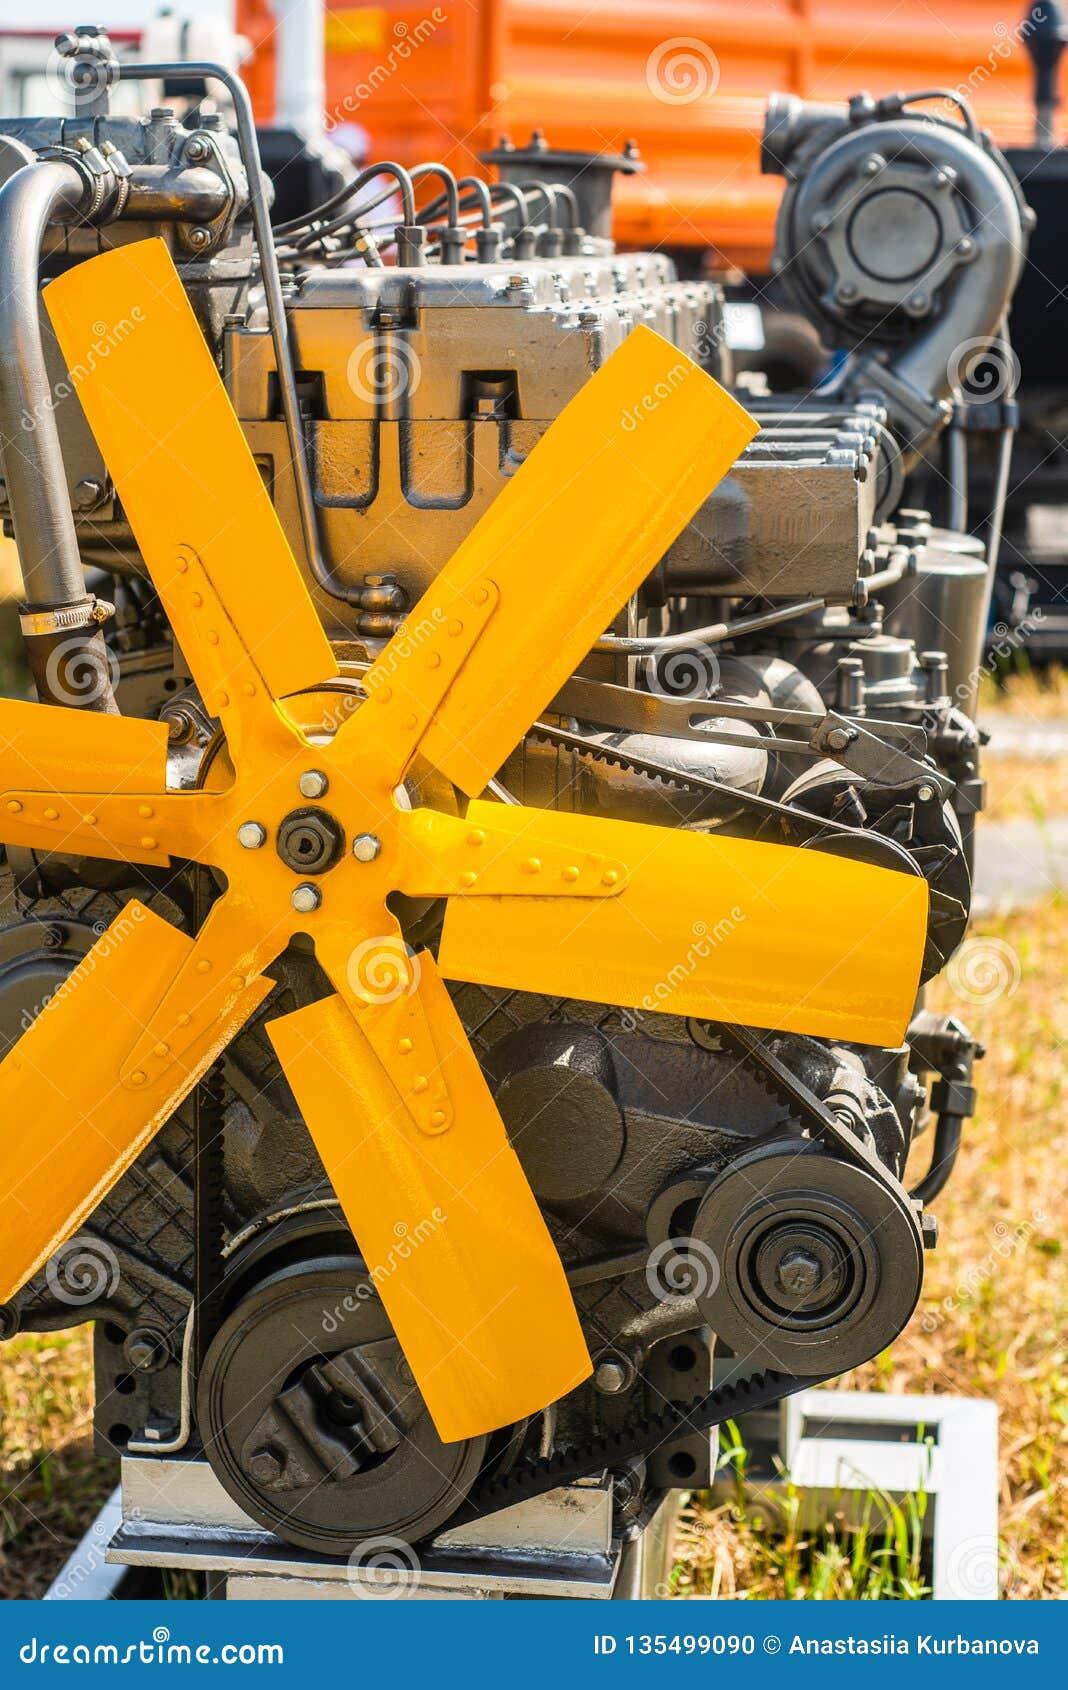 Bomba do metal, motor, peças para a maquinaria agrícola